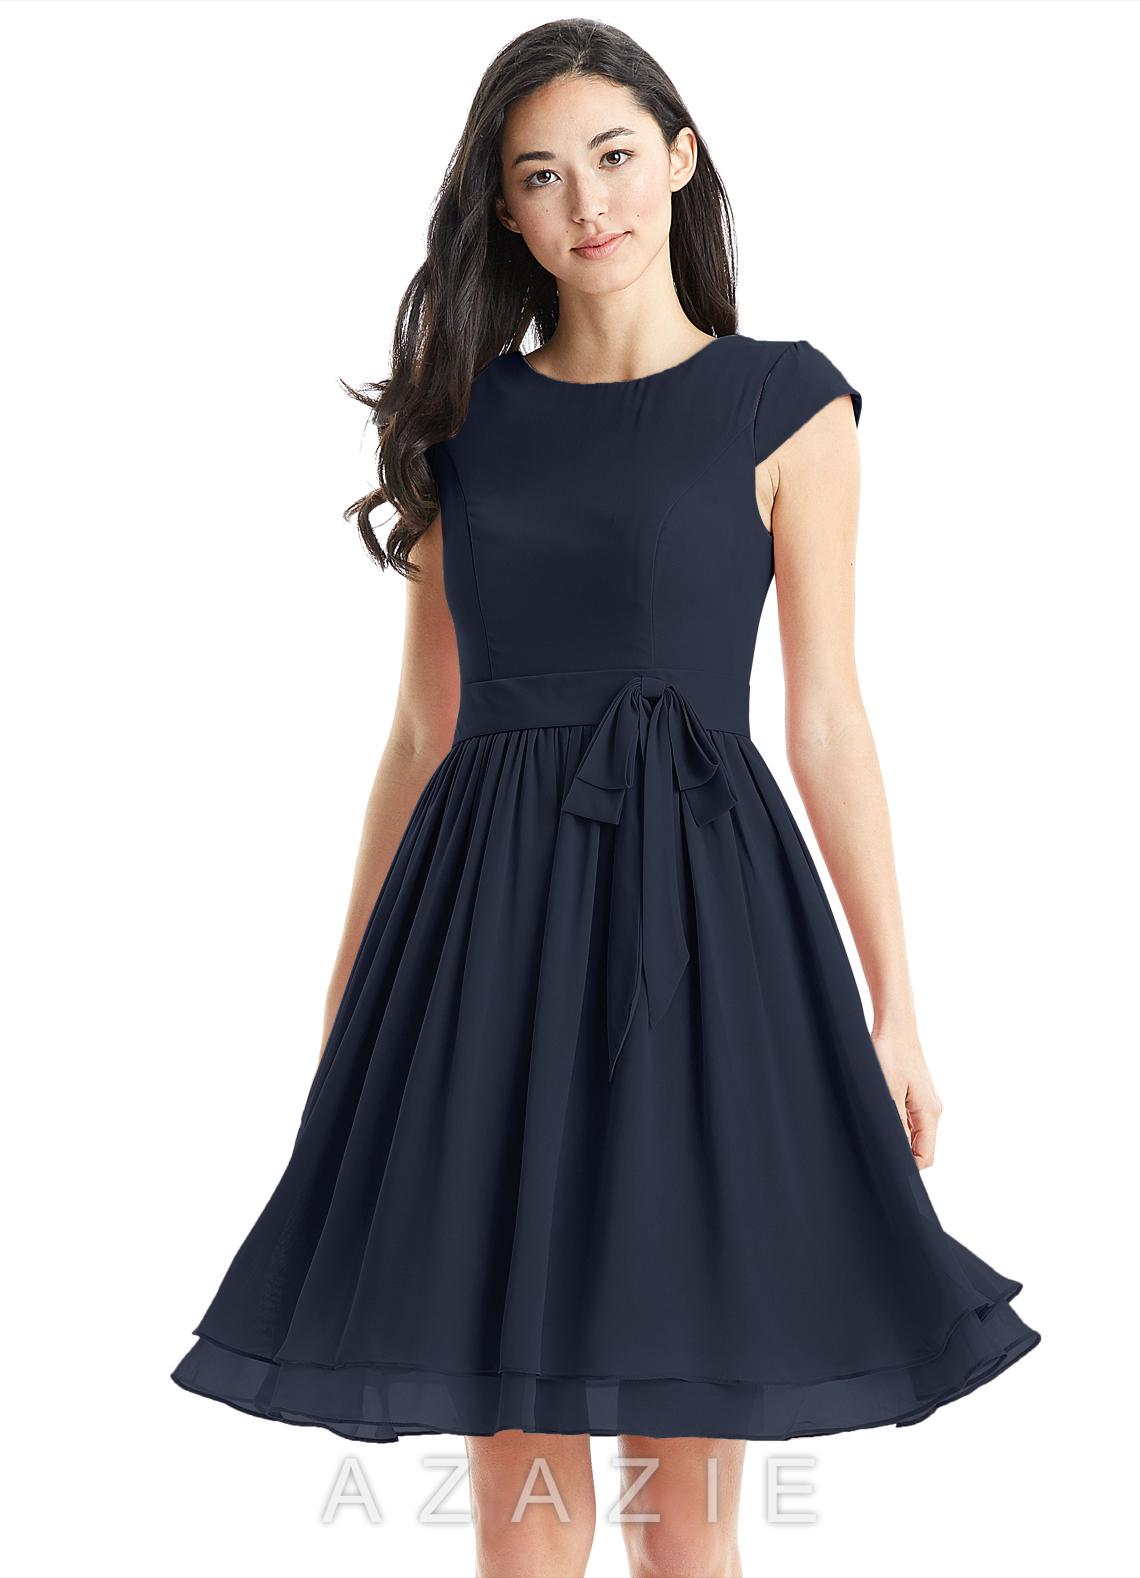 437122a0ce93c Azazie Ingrid Bridesmaid Dress   Azazie